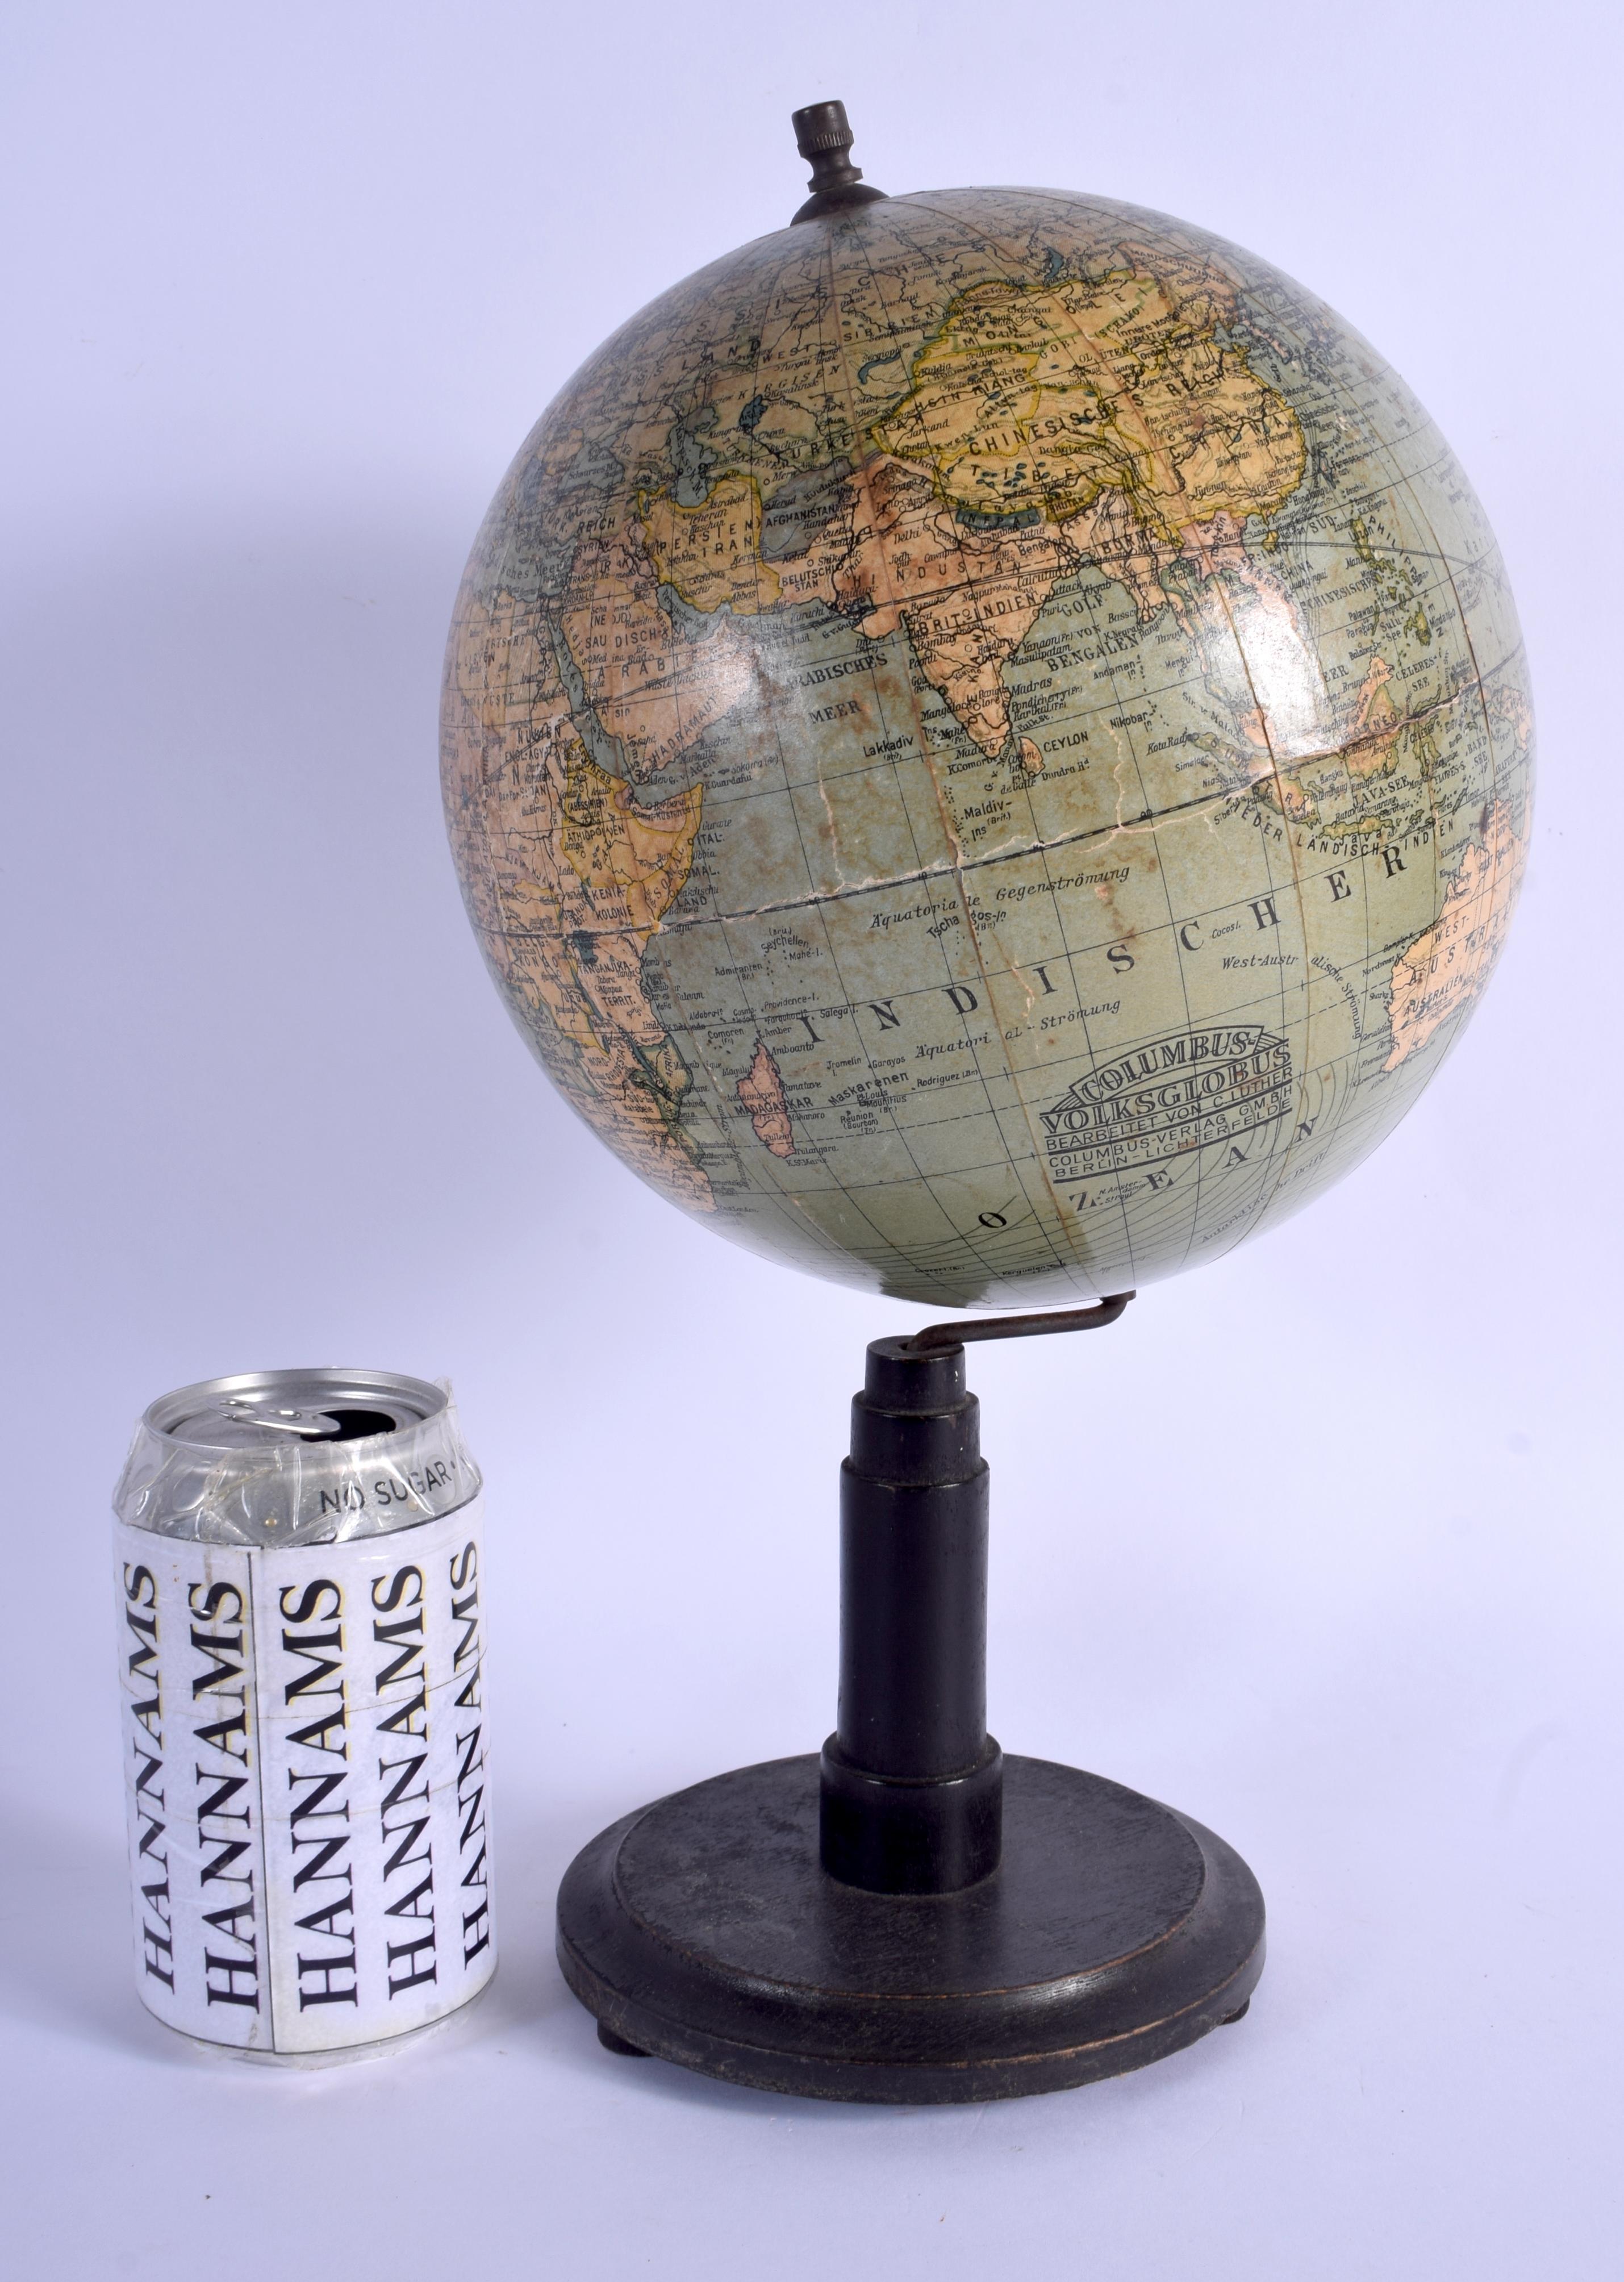 A VINTAGE COLUMBUS VOLKSGLOBUS GLOBE. 33 cm x 16 cm.